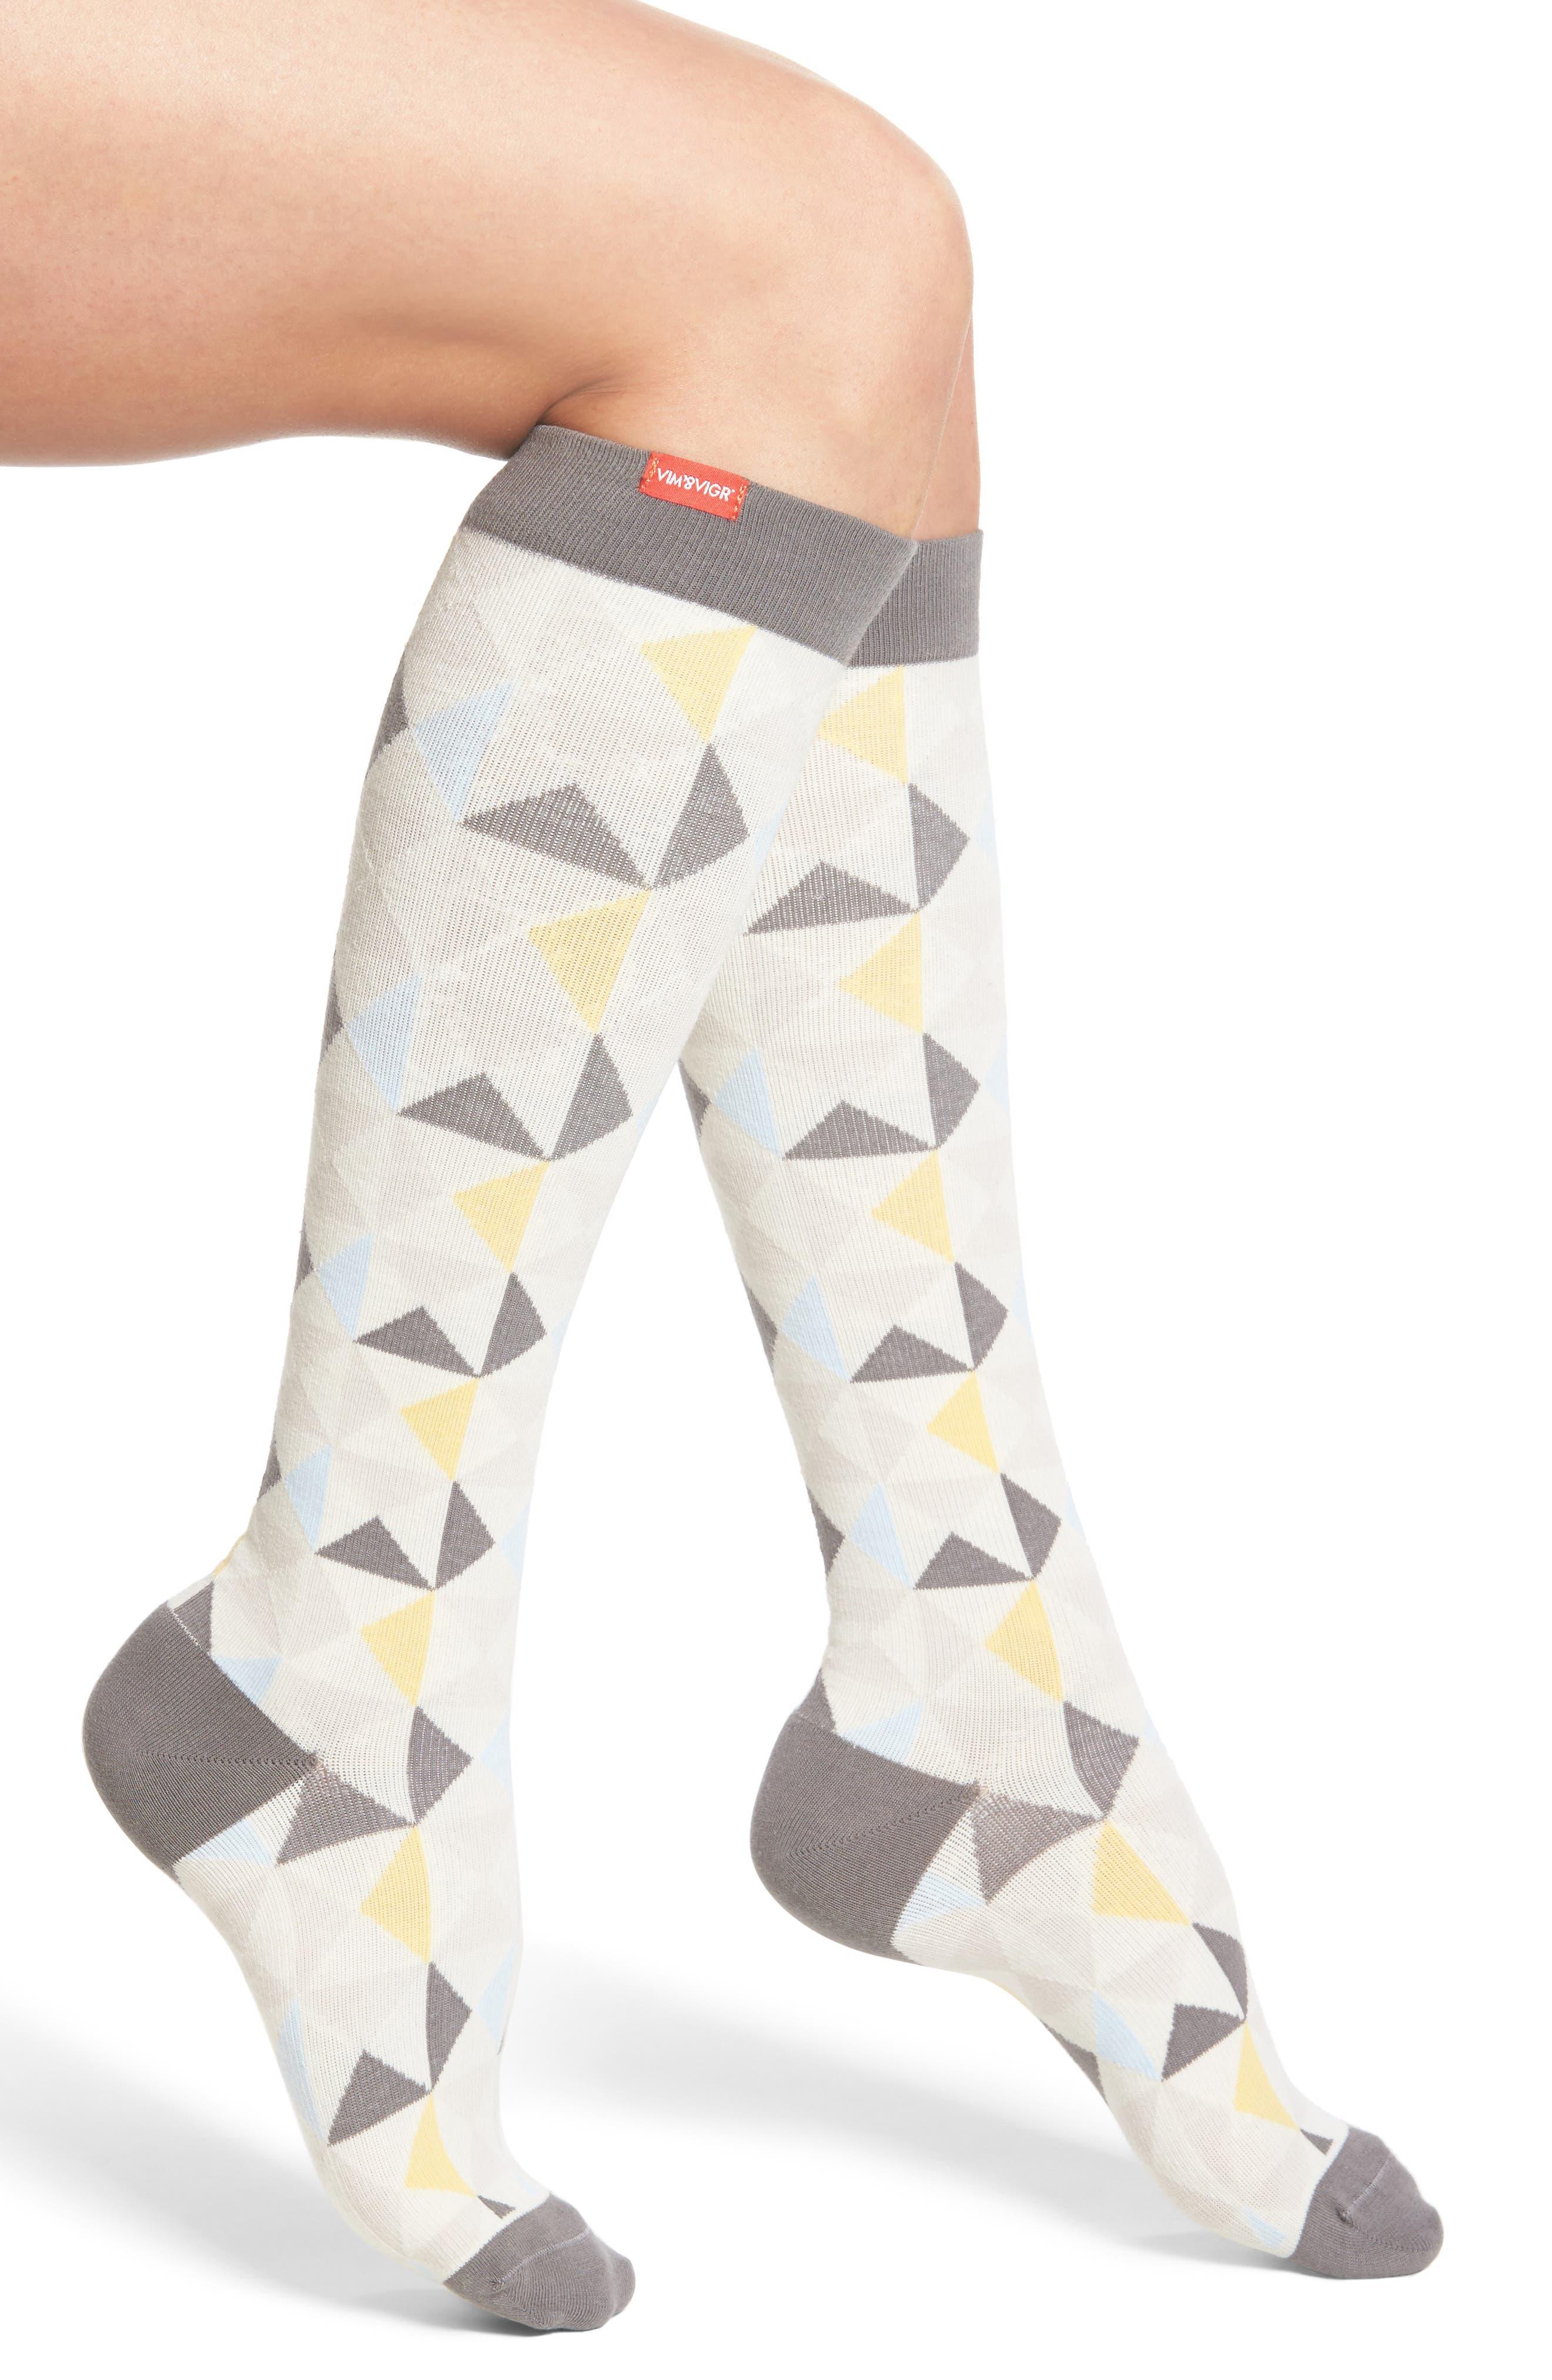 Compression Knee High Socks,                         Main,                         color, Grey/ Gold